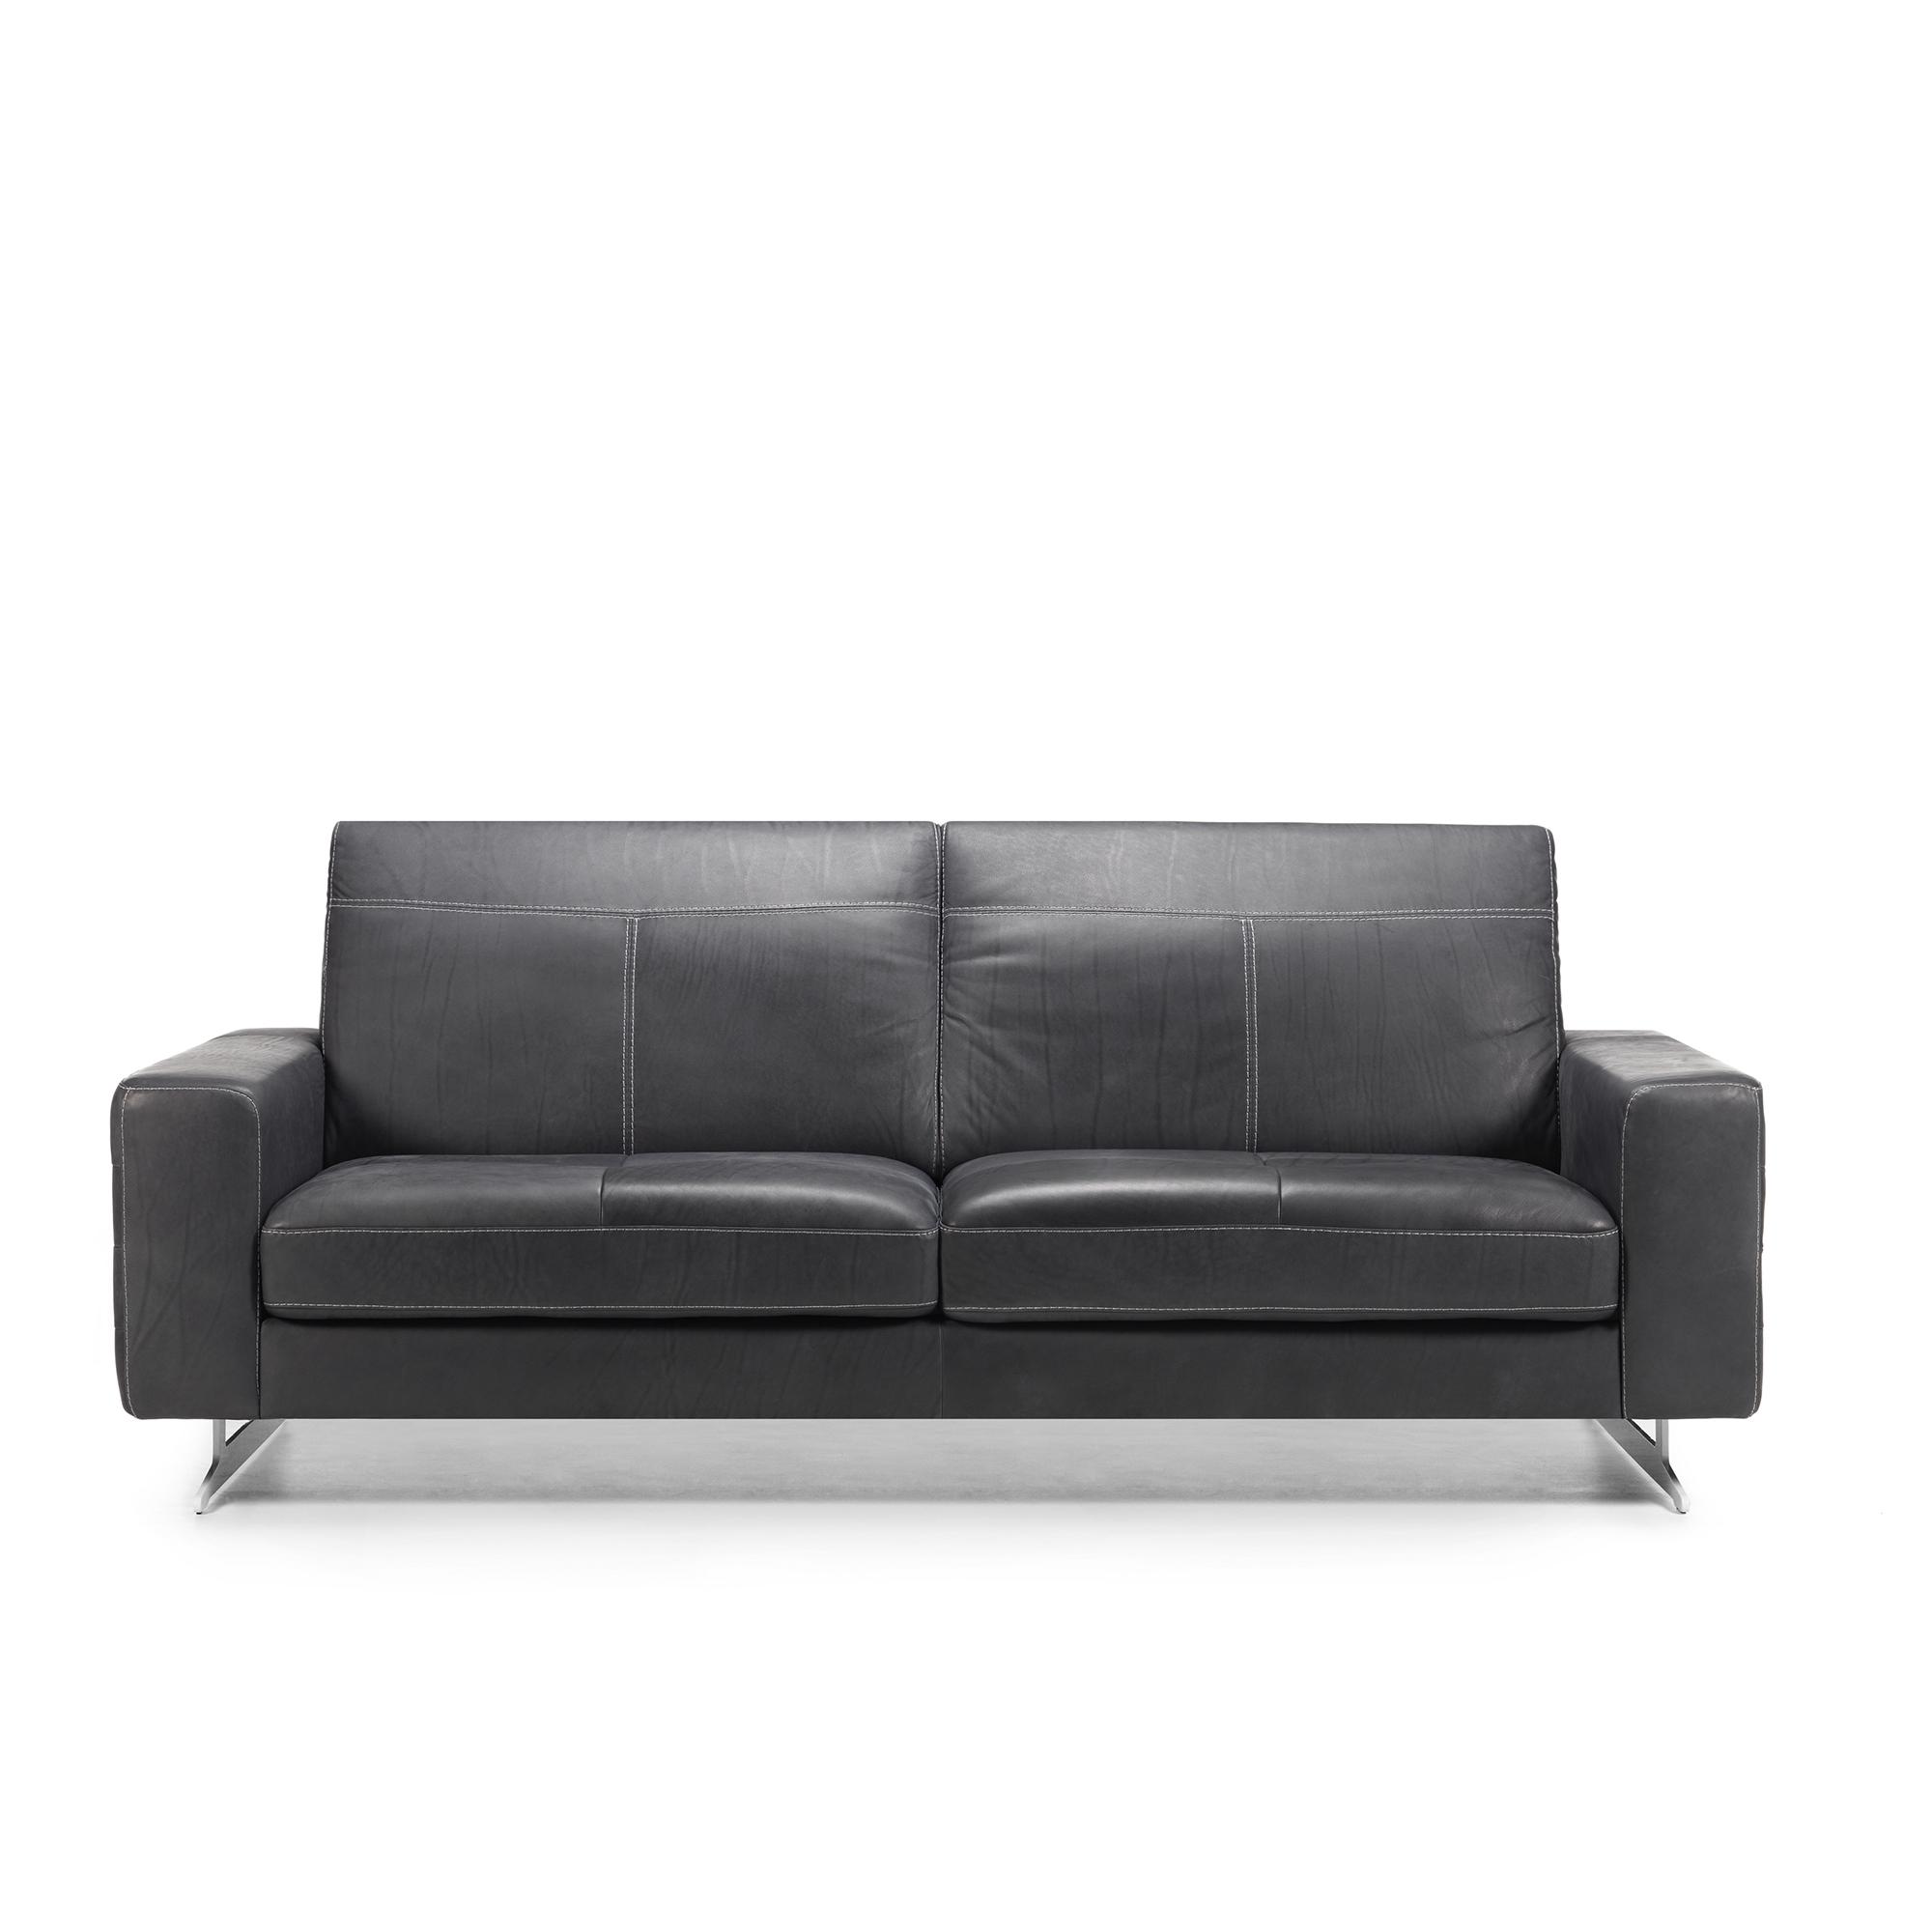 Rom Maori Sofa Leather Sofas Cookes Furniture